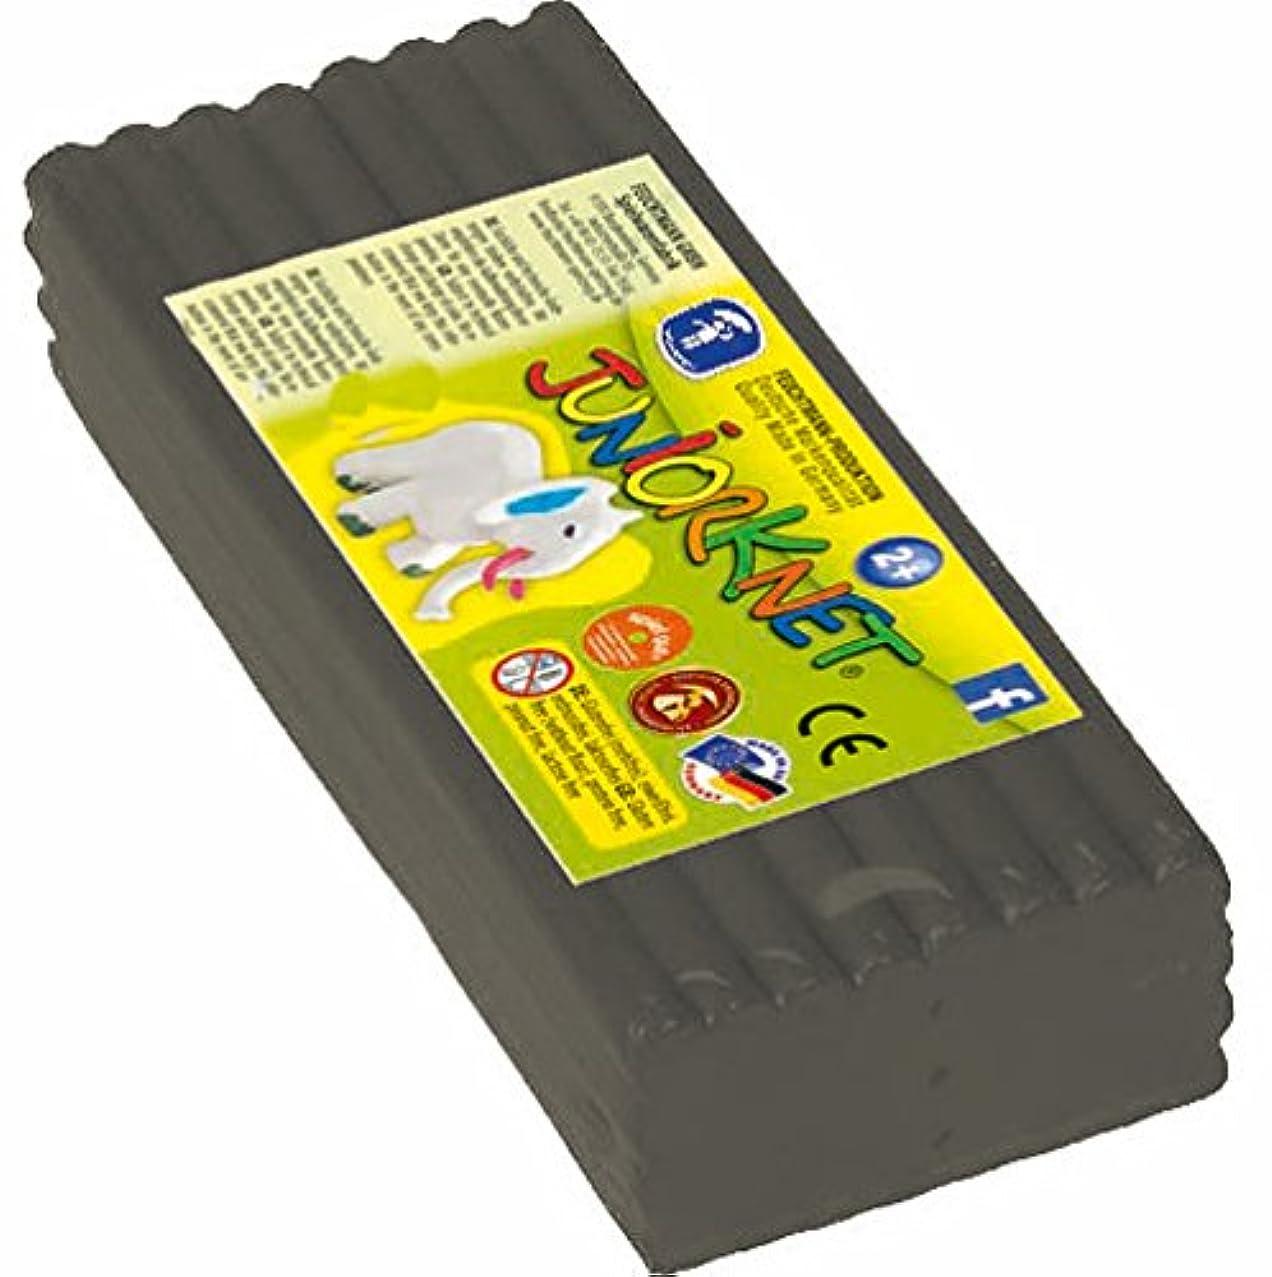 Feuchtmann 628 0305-12 Juniorknet Jumbo Pack -Clay Dough- 500 G - Grey, Multi Colour